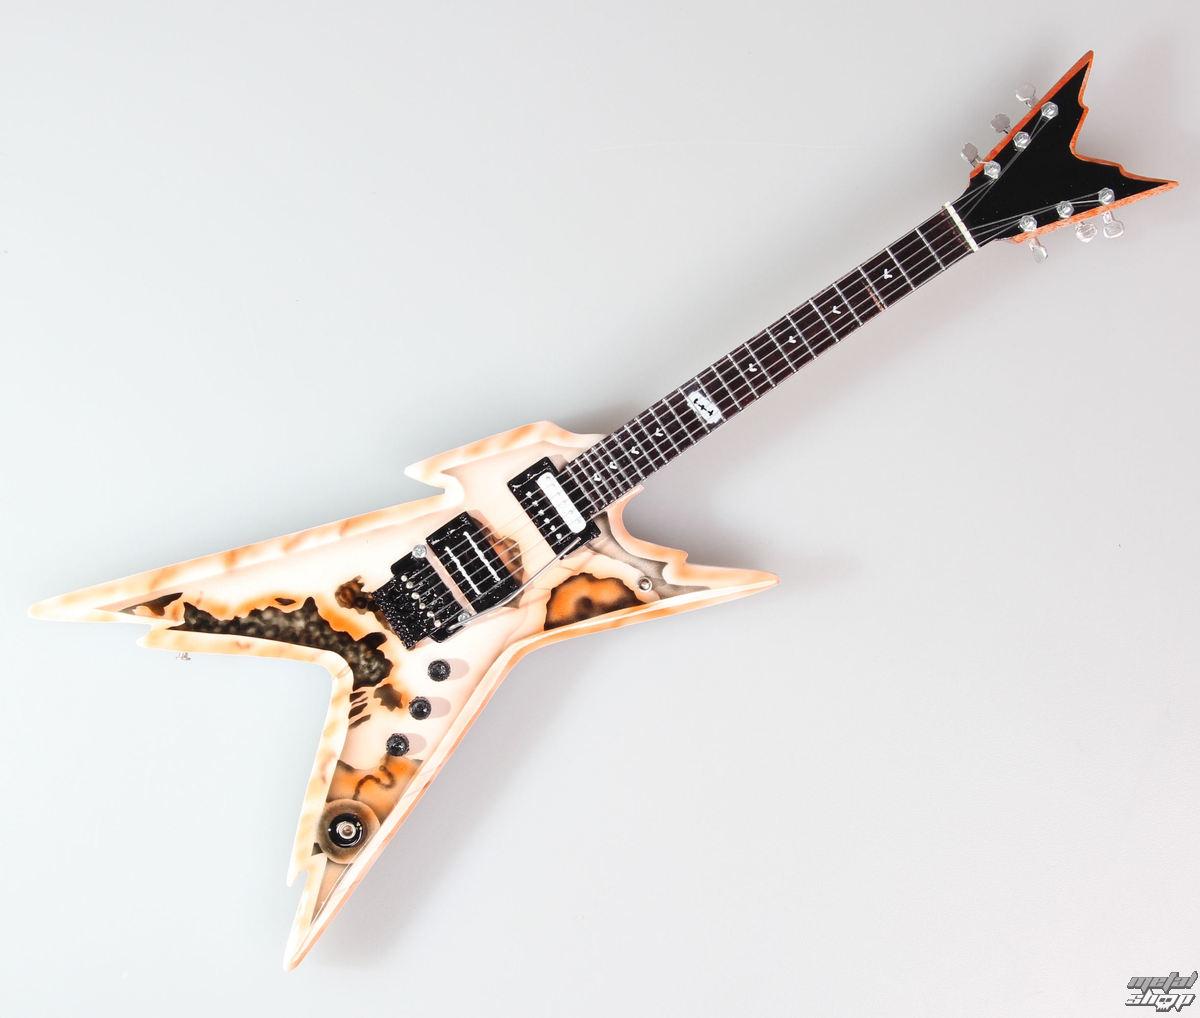 gitara Pantera - Dimebag Darrell - Razorback - MINI GUITAR USA - DDPink